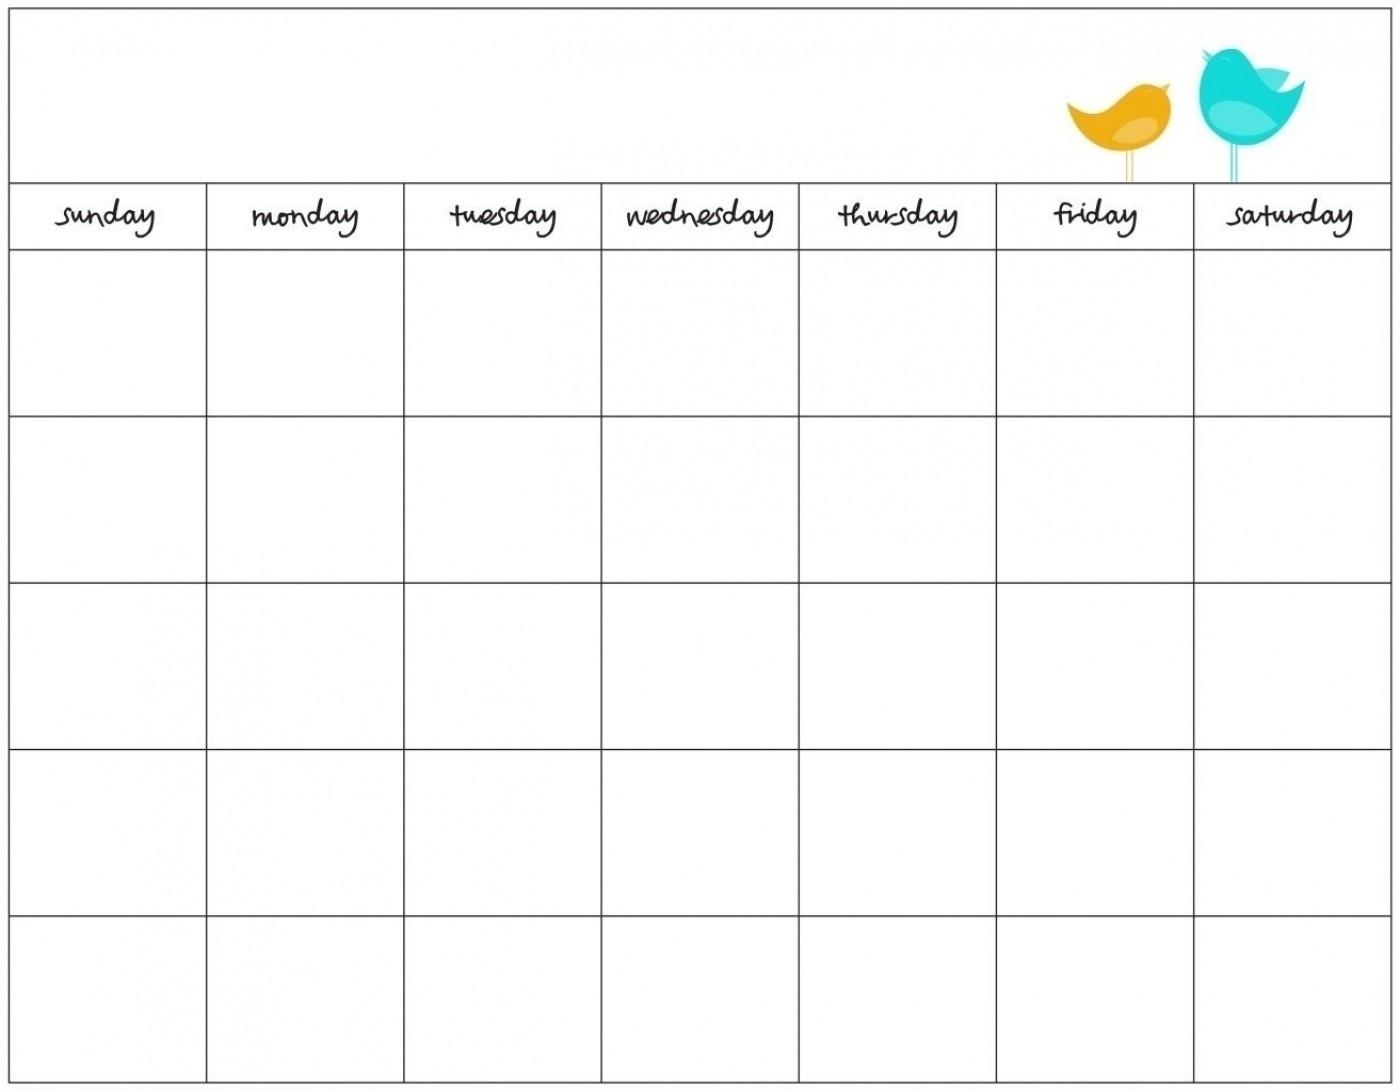 Printable Calendar Days Of The Week | Ten Free Printable in 7 Day Calendar Template